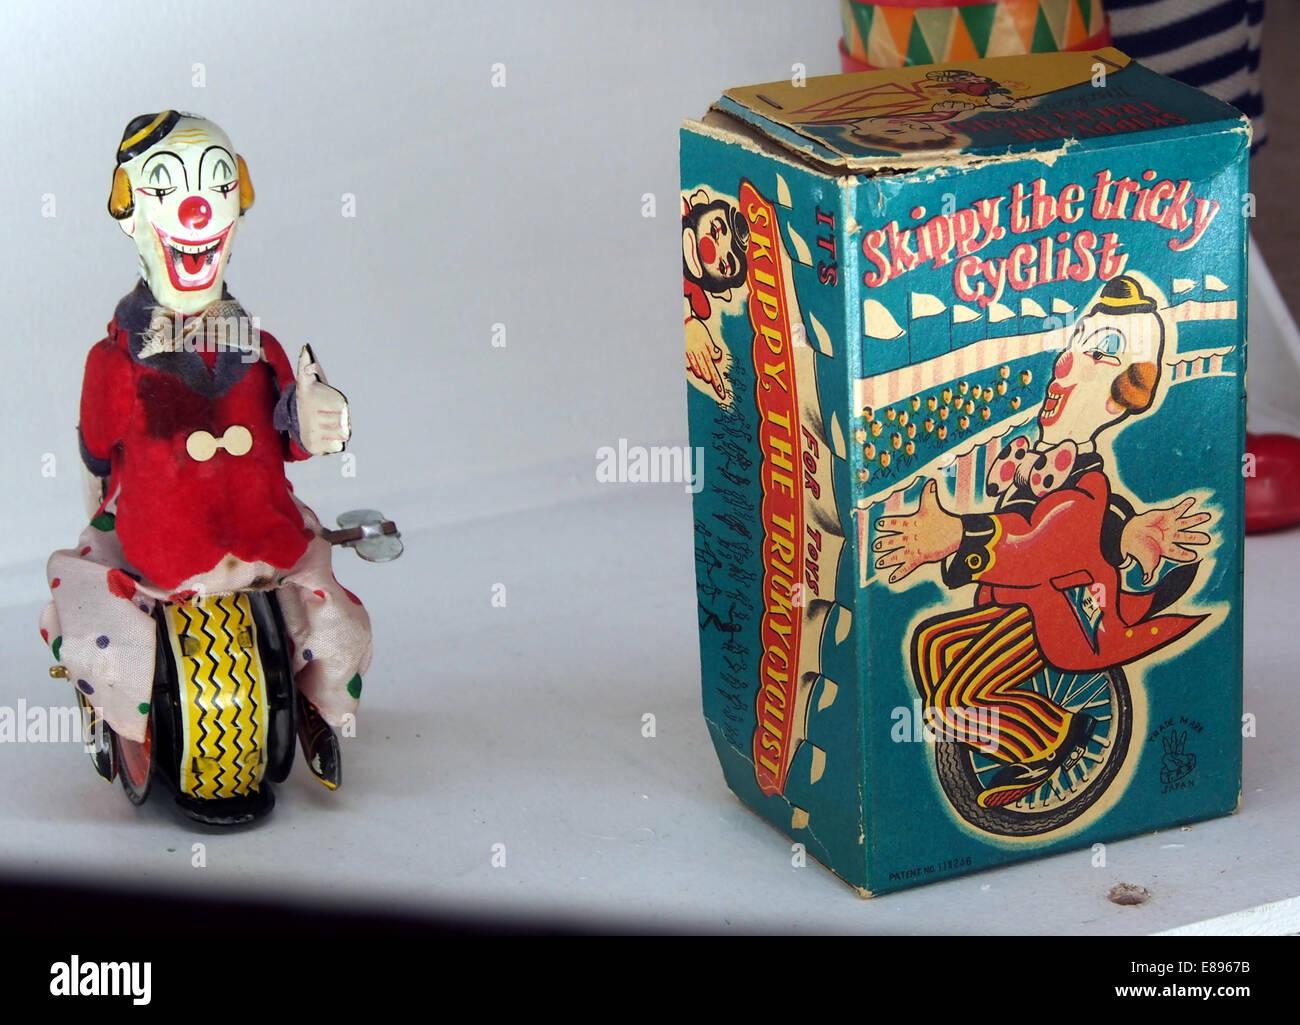 Skippy tricky cyclist, tin toy, MusC3A9e du jouet de Colmar - Stock Image